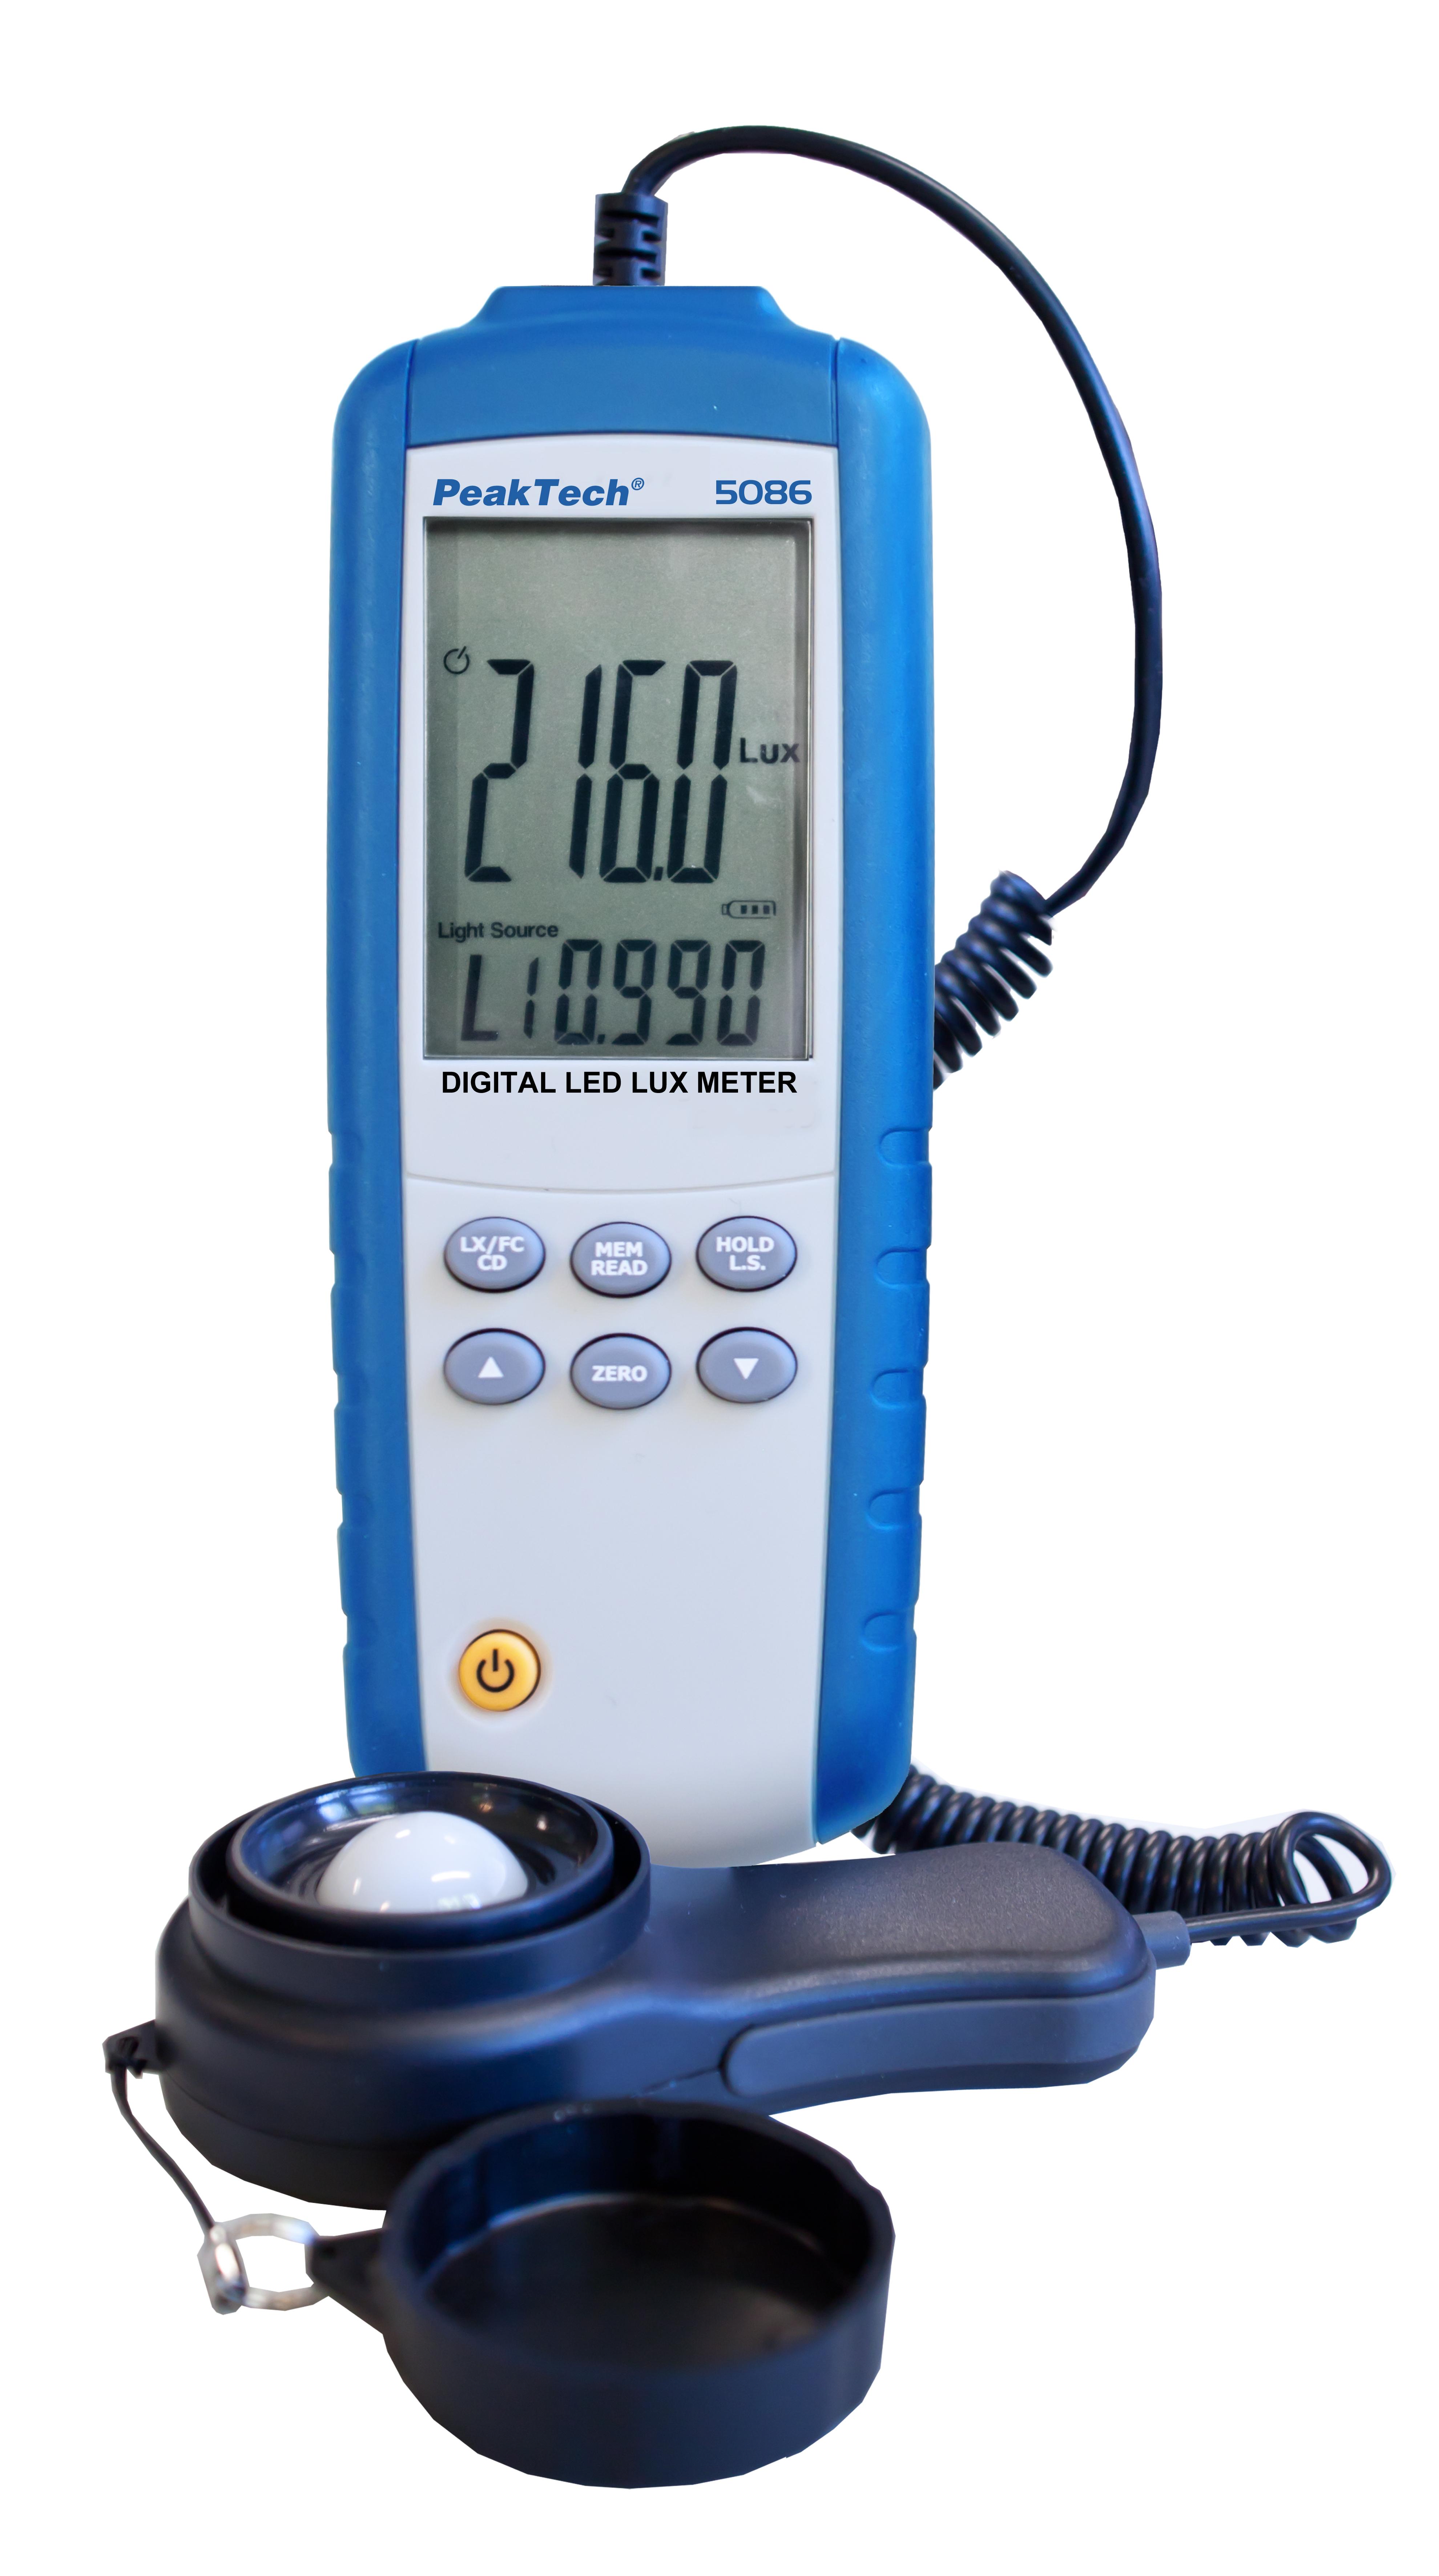 «PeakTech® P 5086» Digital LED Lux Meter, 3 3/4-digit